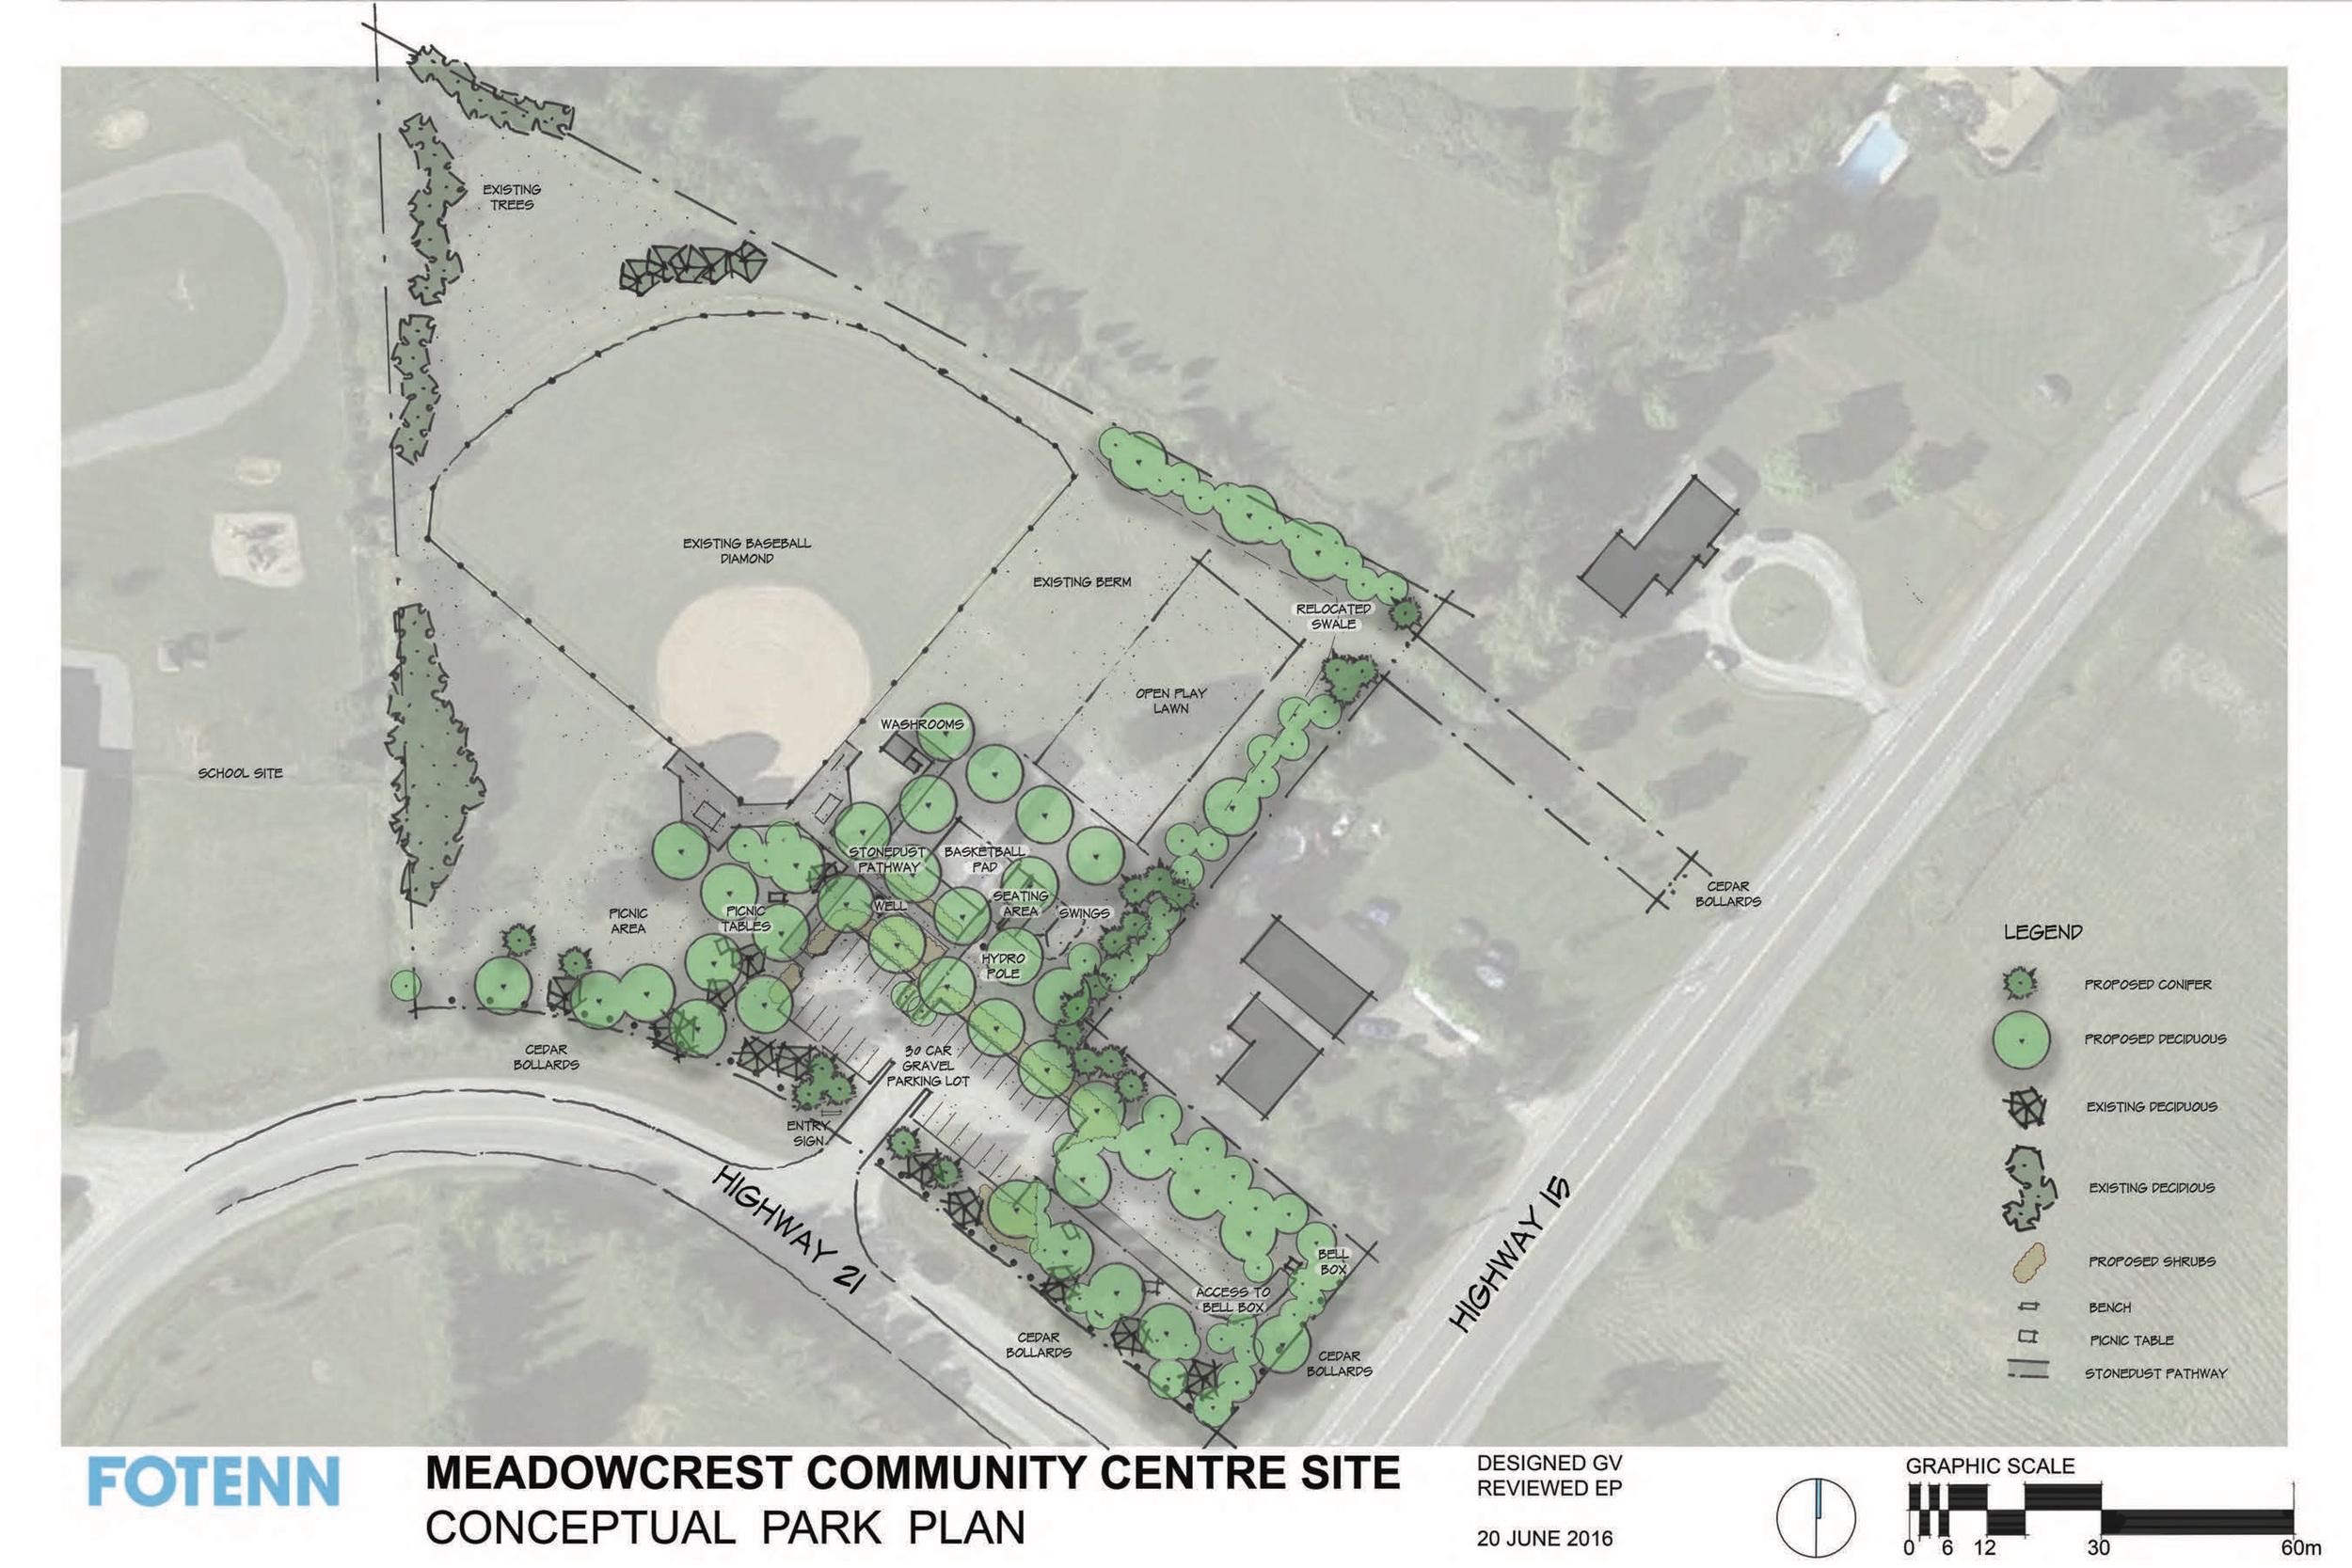 Meadowcrest Park Concept - Click to Enlarge